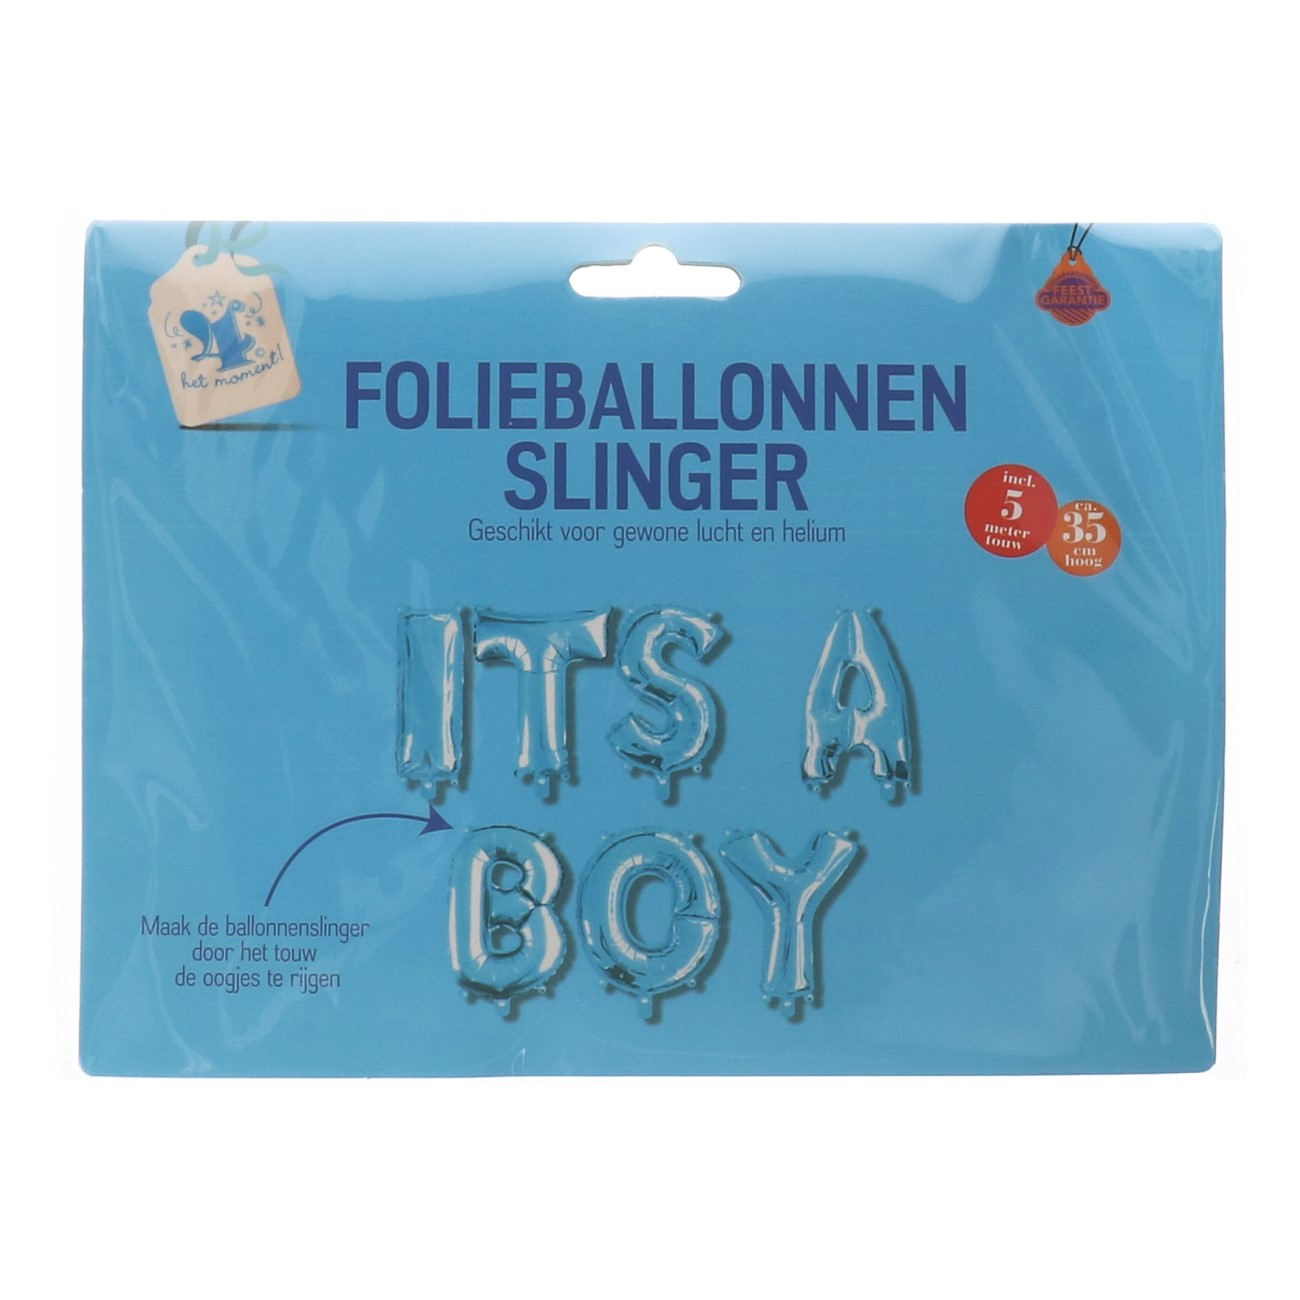 Folieballon It's a boy slinger